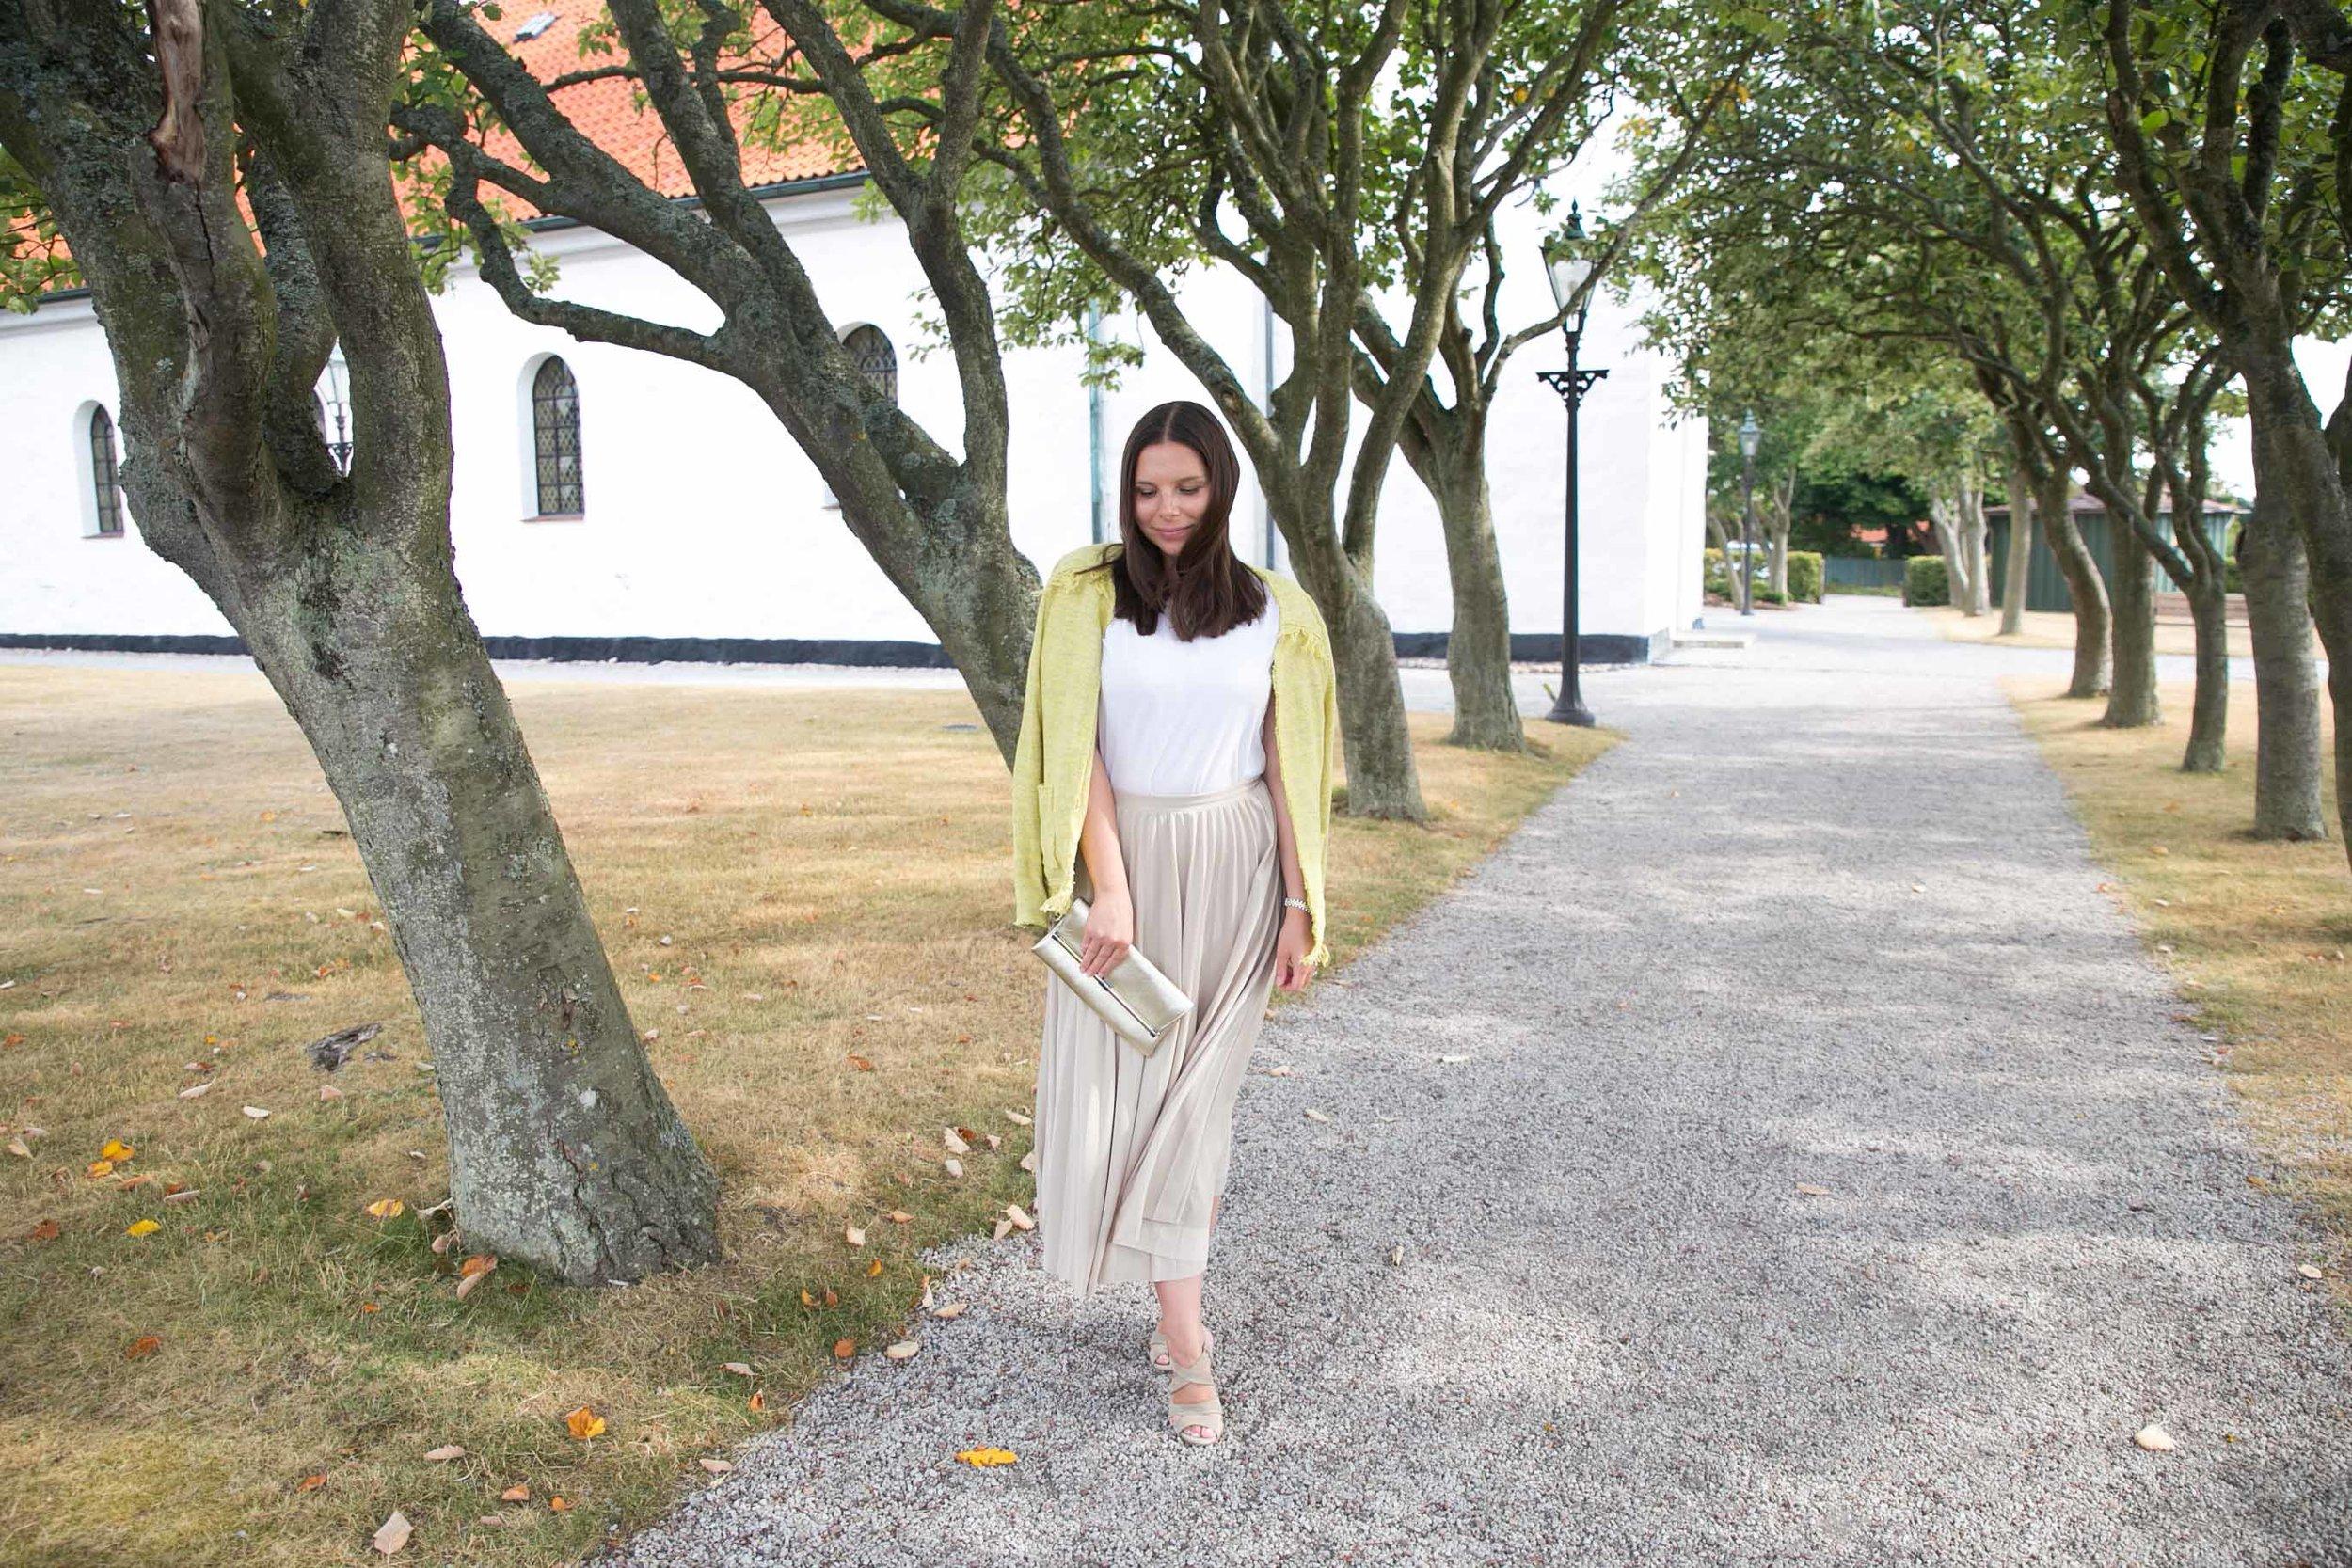 Marzio esprit hm dvf outfit modeblogg .jpg